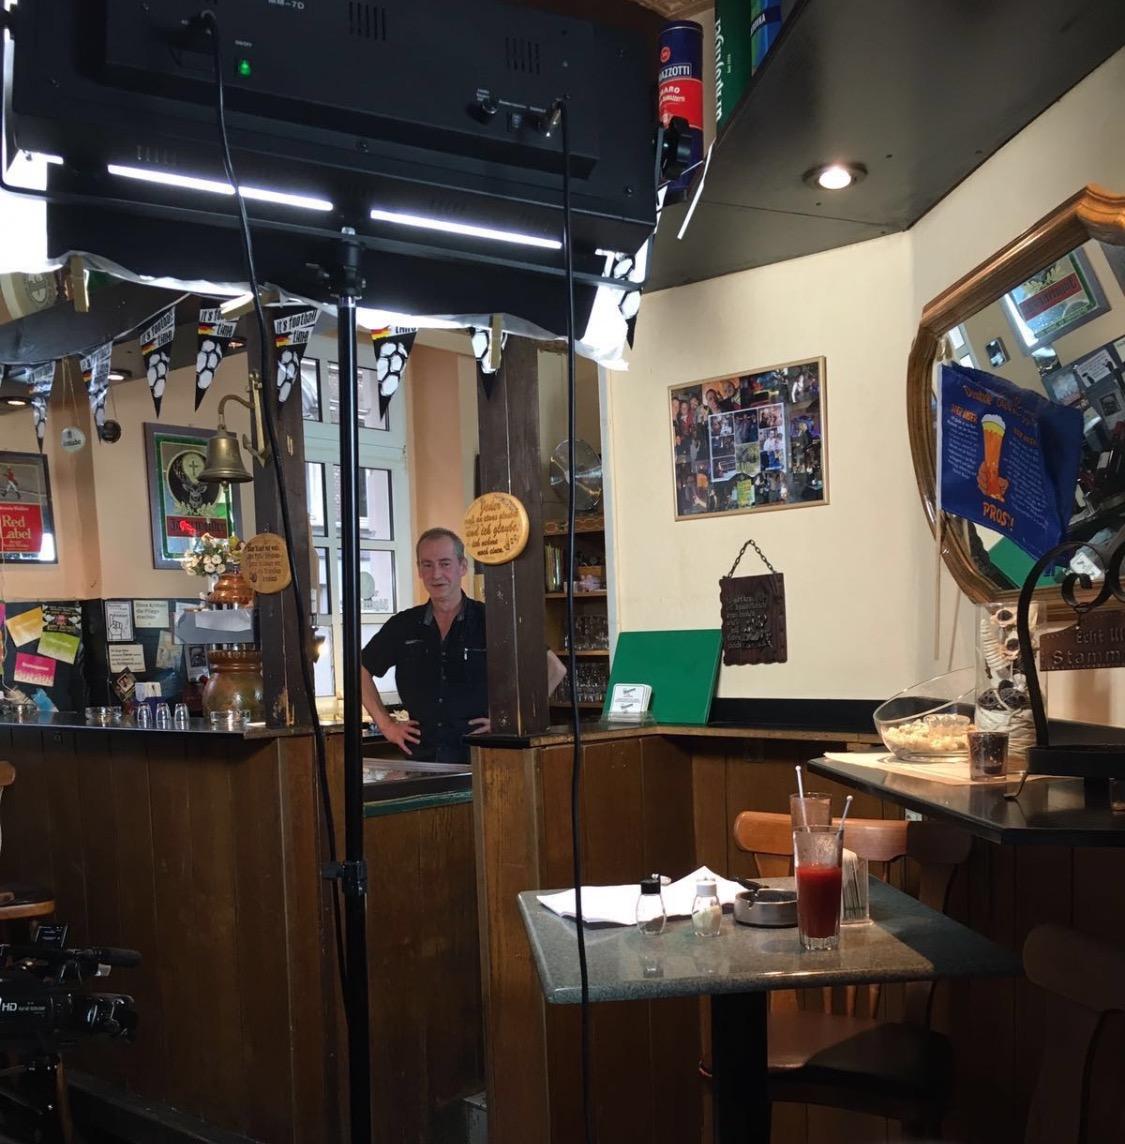 Dreh Imagevideo Bar